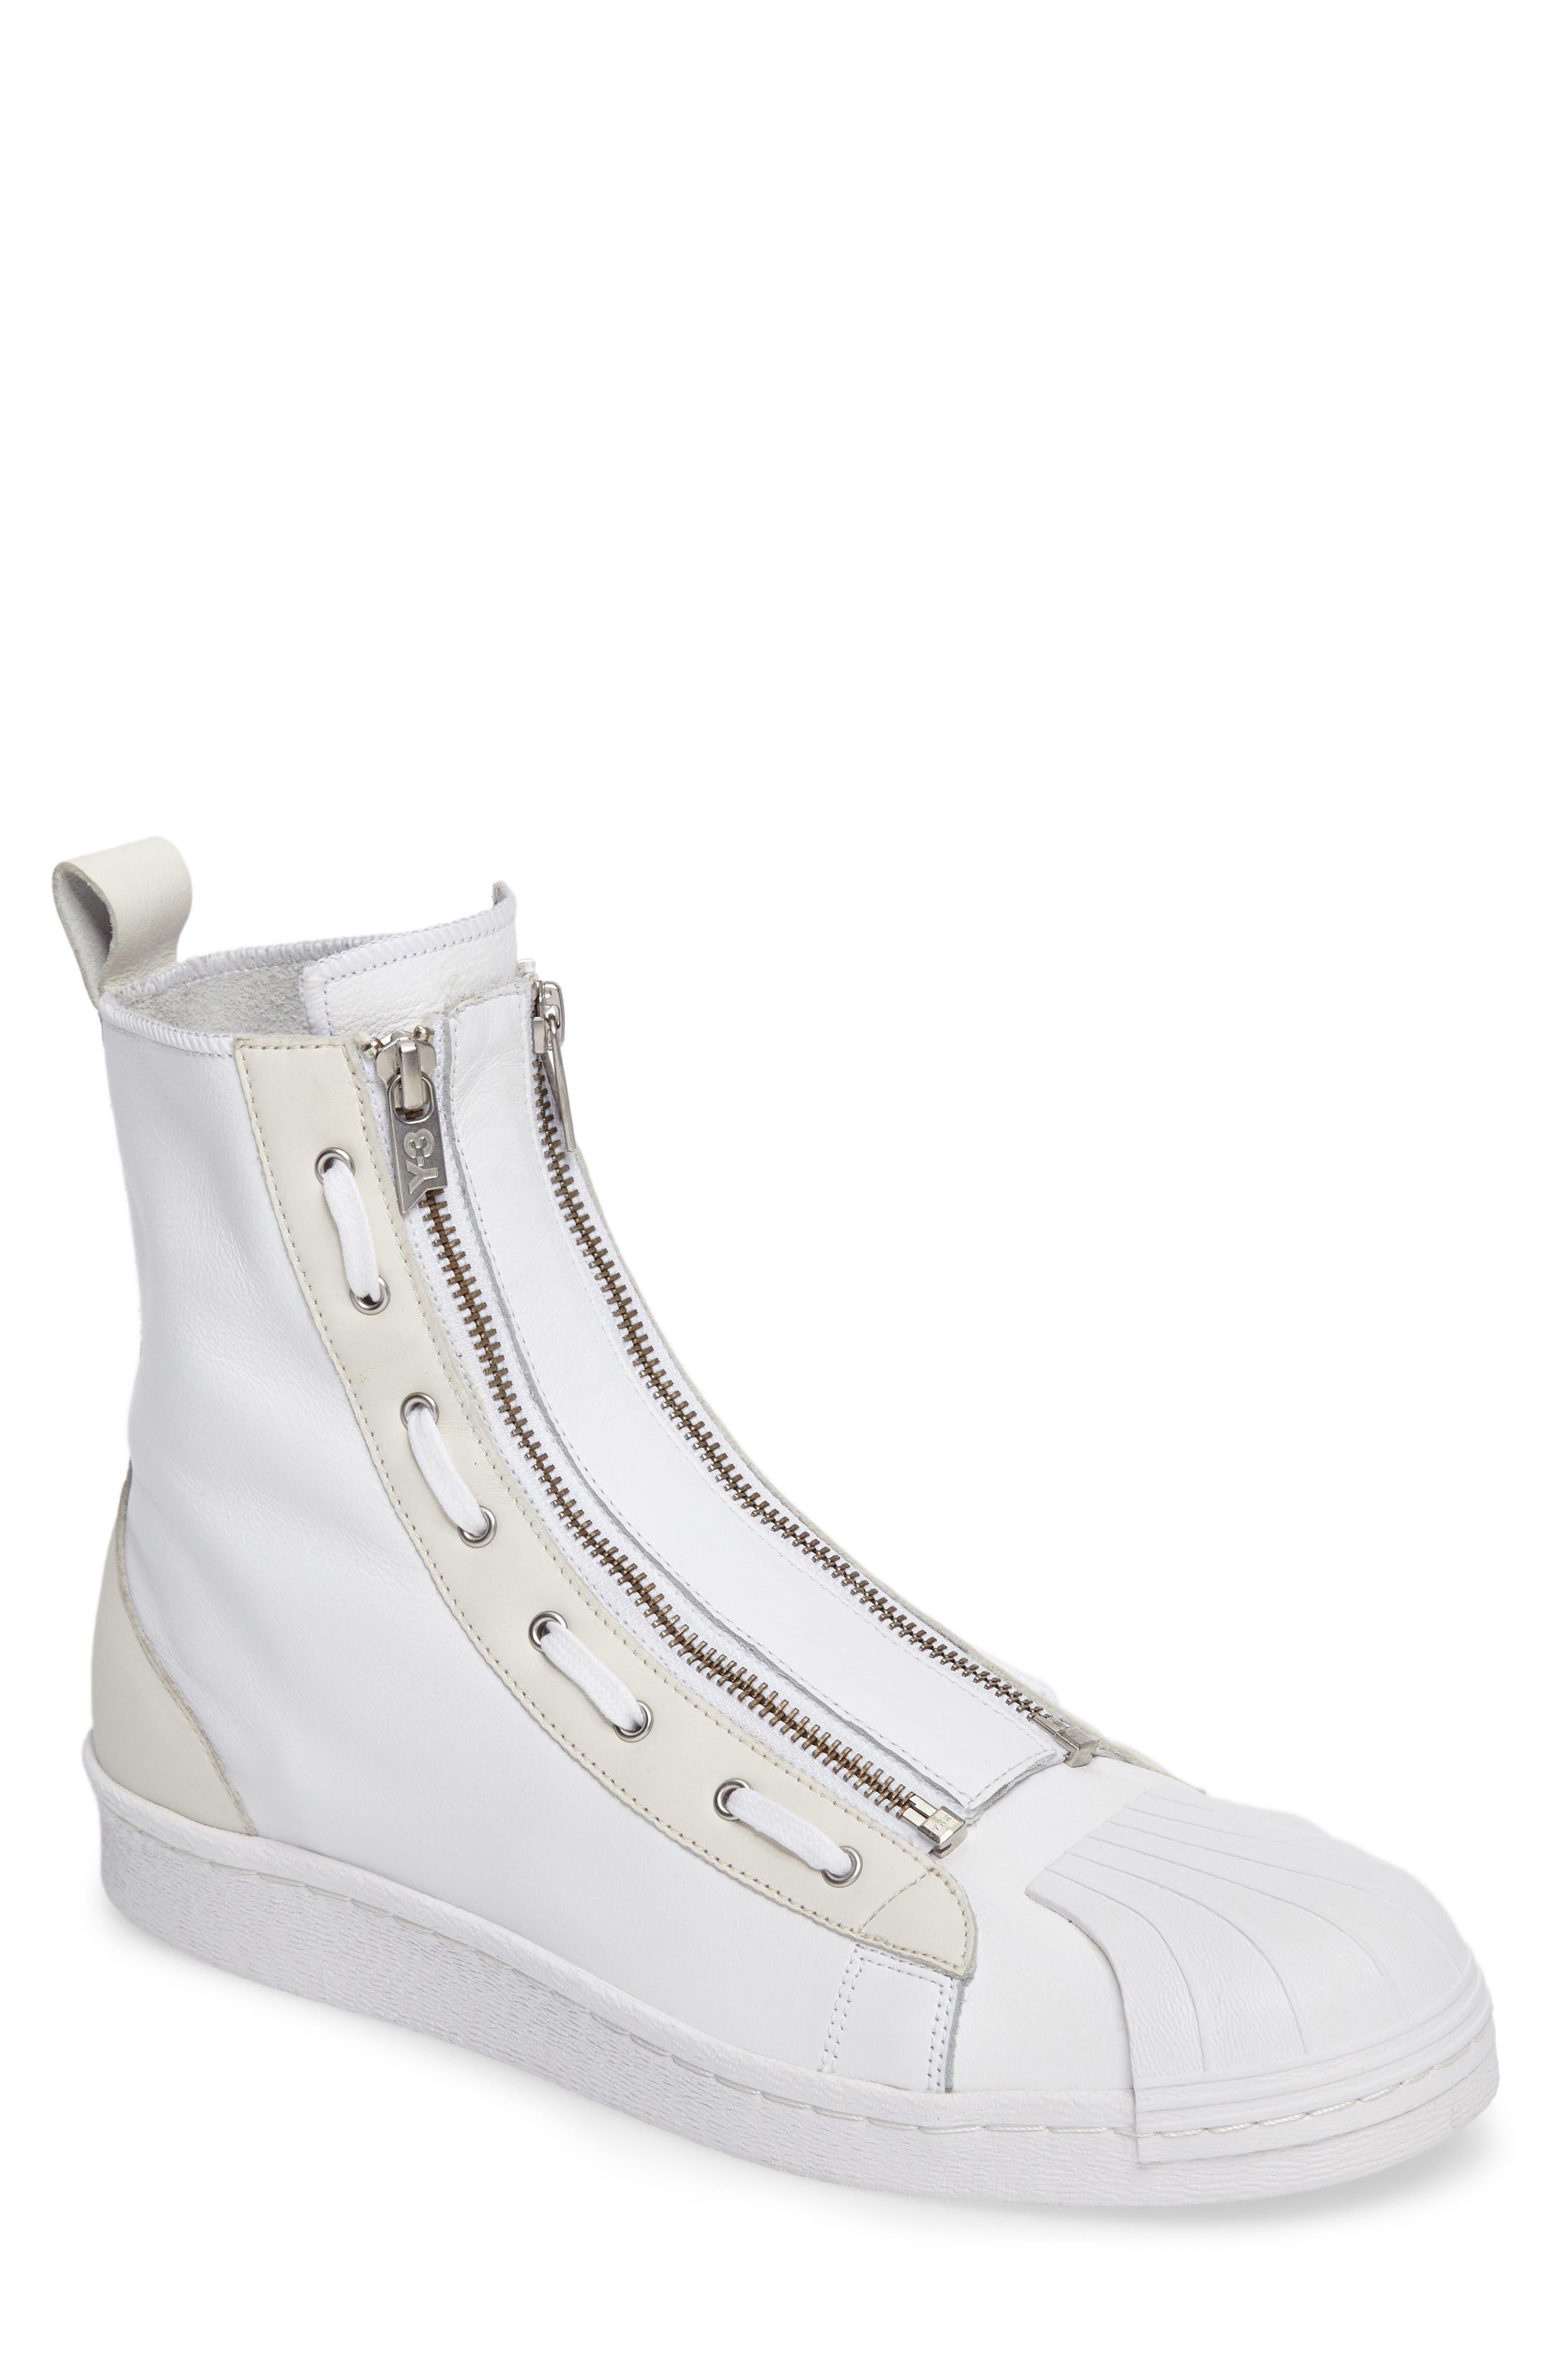 Alternate Image 1 Selected - Y-3 'Pro' High Top Sneaker (Men)